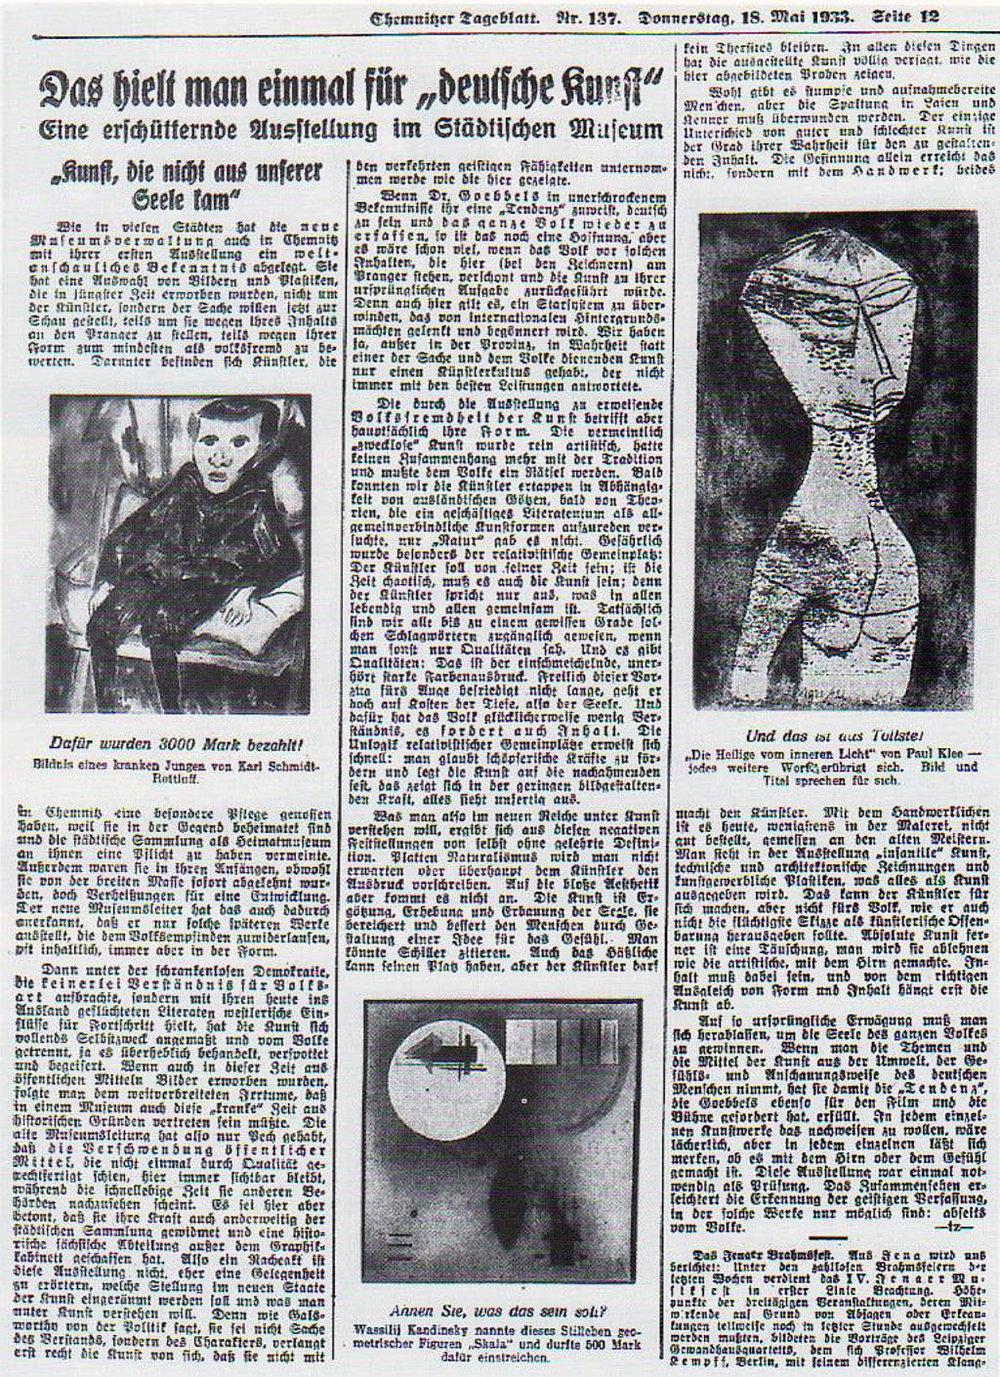 Abb. 8  Artikel aus dem Chemnitzer Tageblatt vom 18. Mai 1933